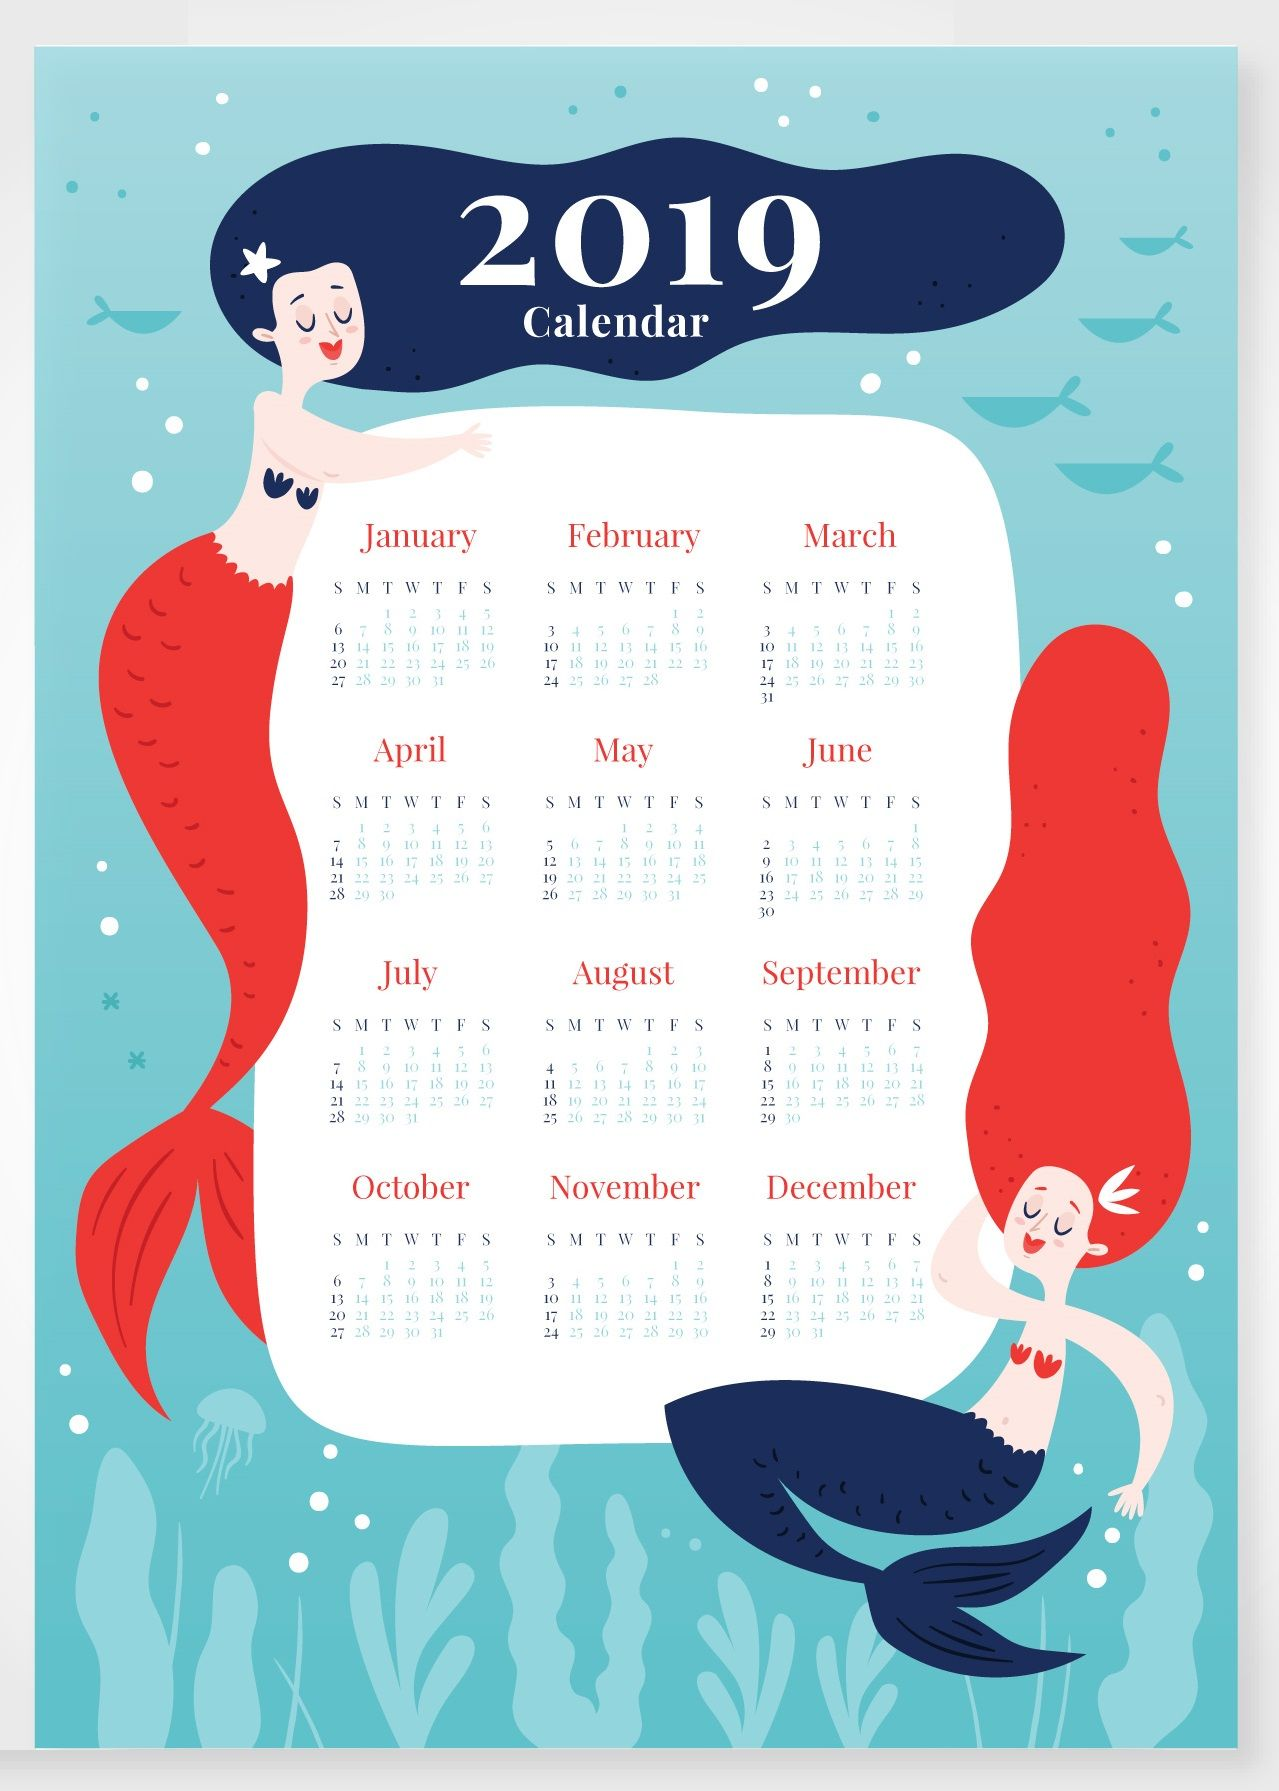 Latest 2019 Calendar Cute Design Free Printable Hd Formats For Desk